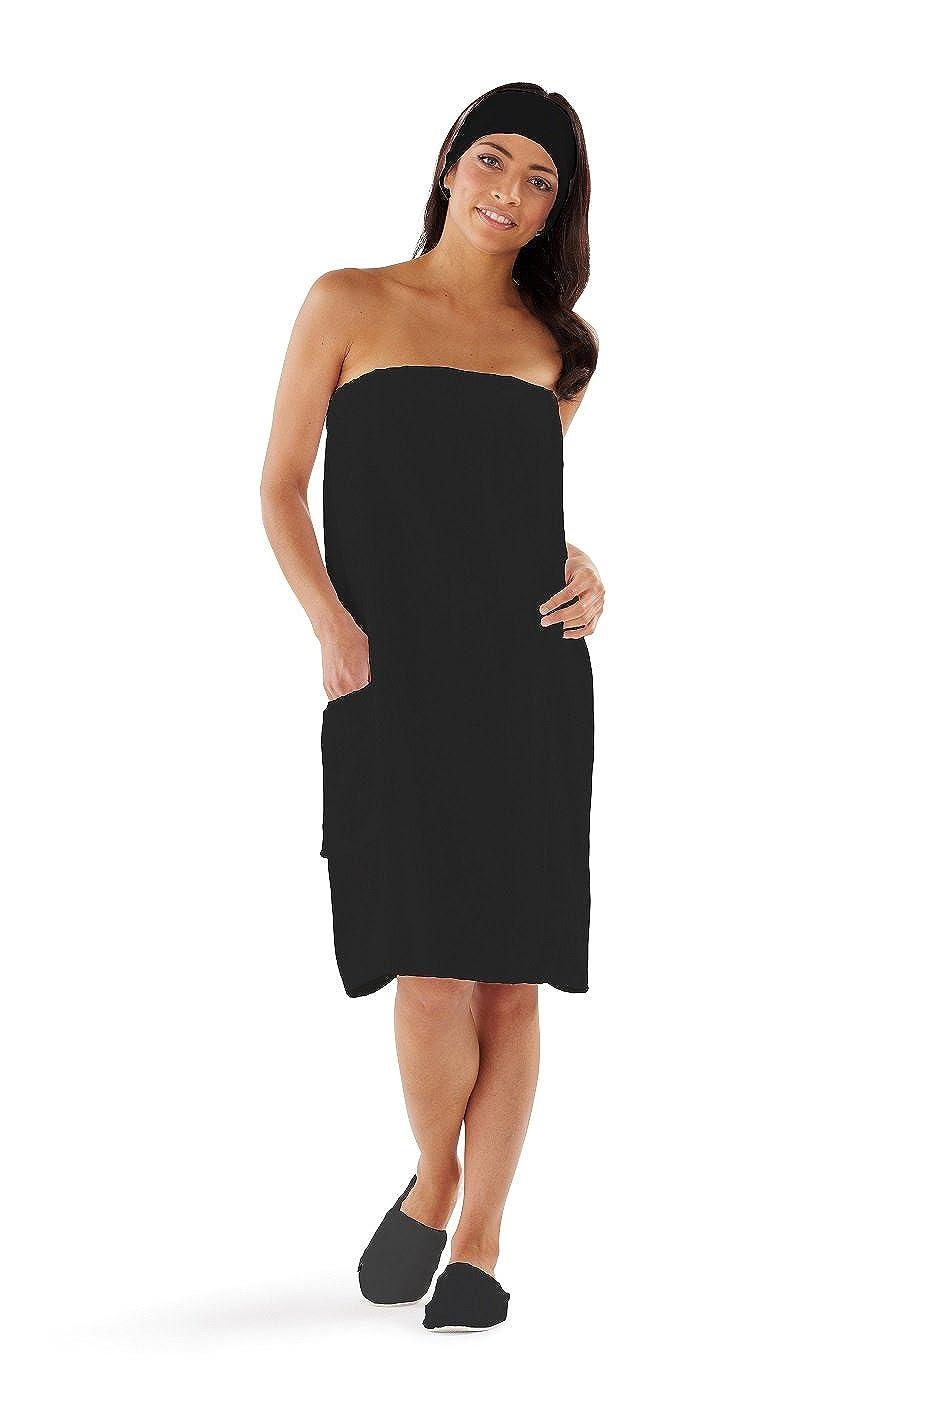 Boca Terry Womens Spa Wrap - 100% Cotton Spa, Shower, Bath and Gym Towel w Snaps - Med/Large, XXL, 4XL, 6XL